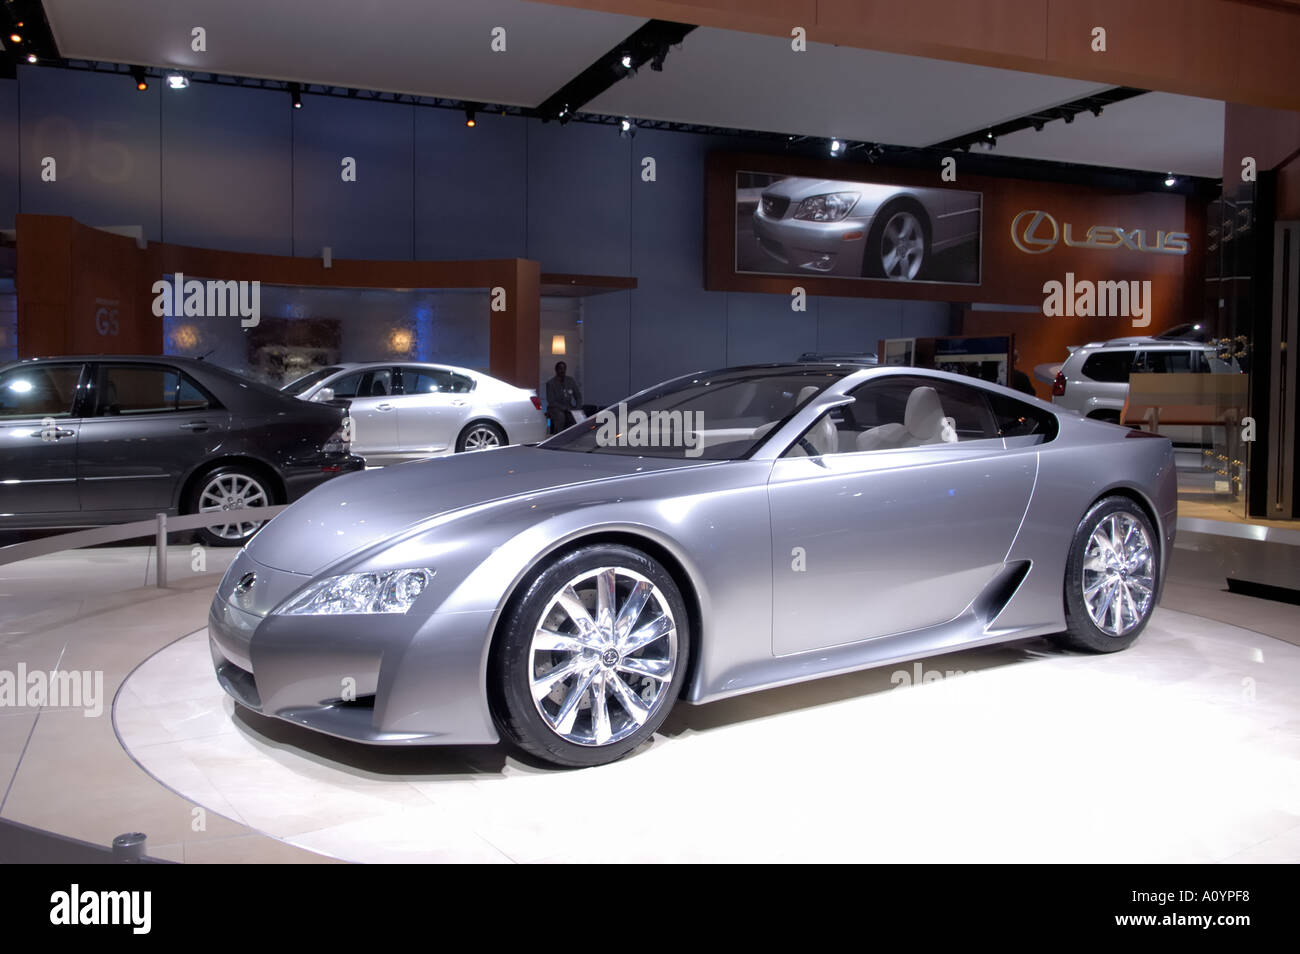 https://c8.alamy.com/comp/A0YPF8/lexus-lf-a-concept-car-at-the-north-american-international-auto-show-A0YPF8.jpg